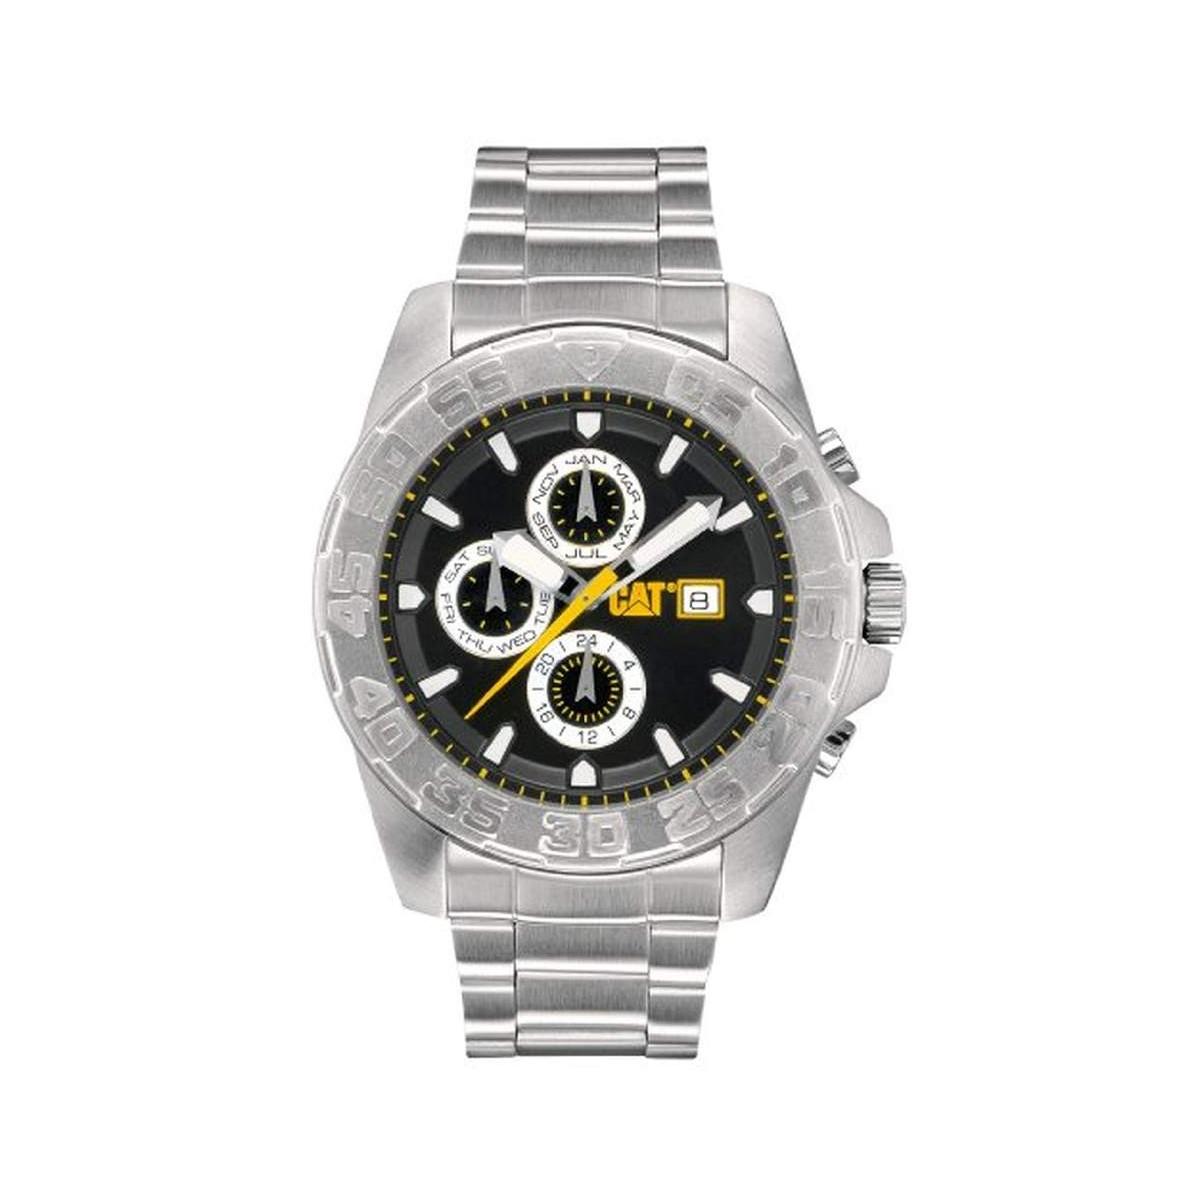 https://www.gaberjoyeria.com/3415-thickbox_default/reloj-caterpillar-pn14911122.jpg